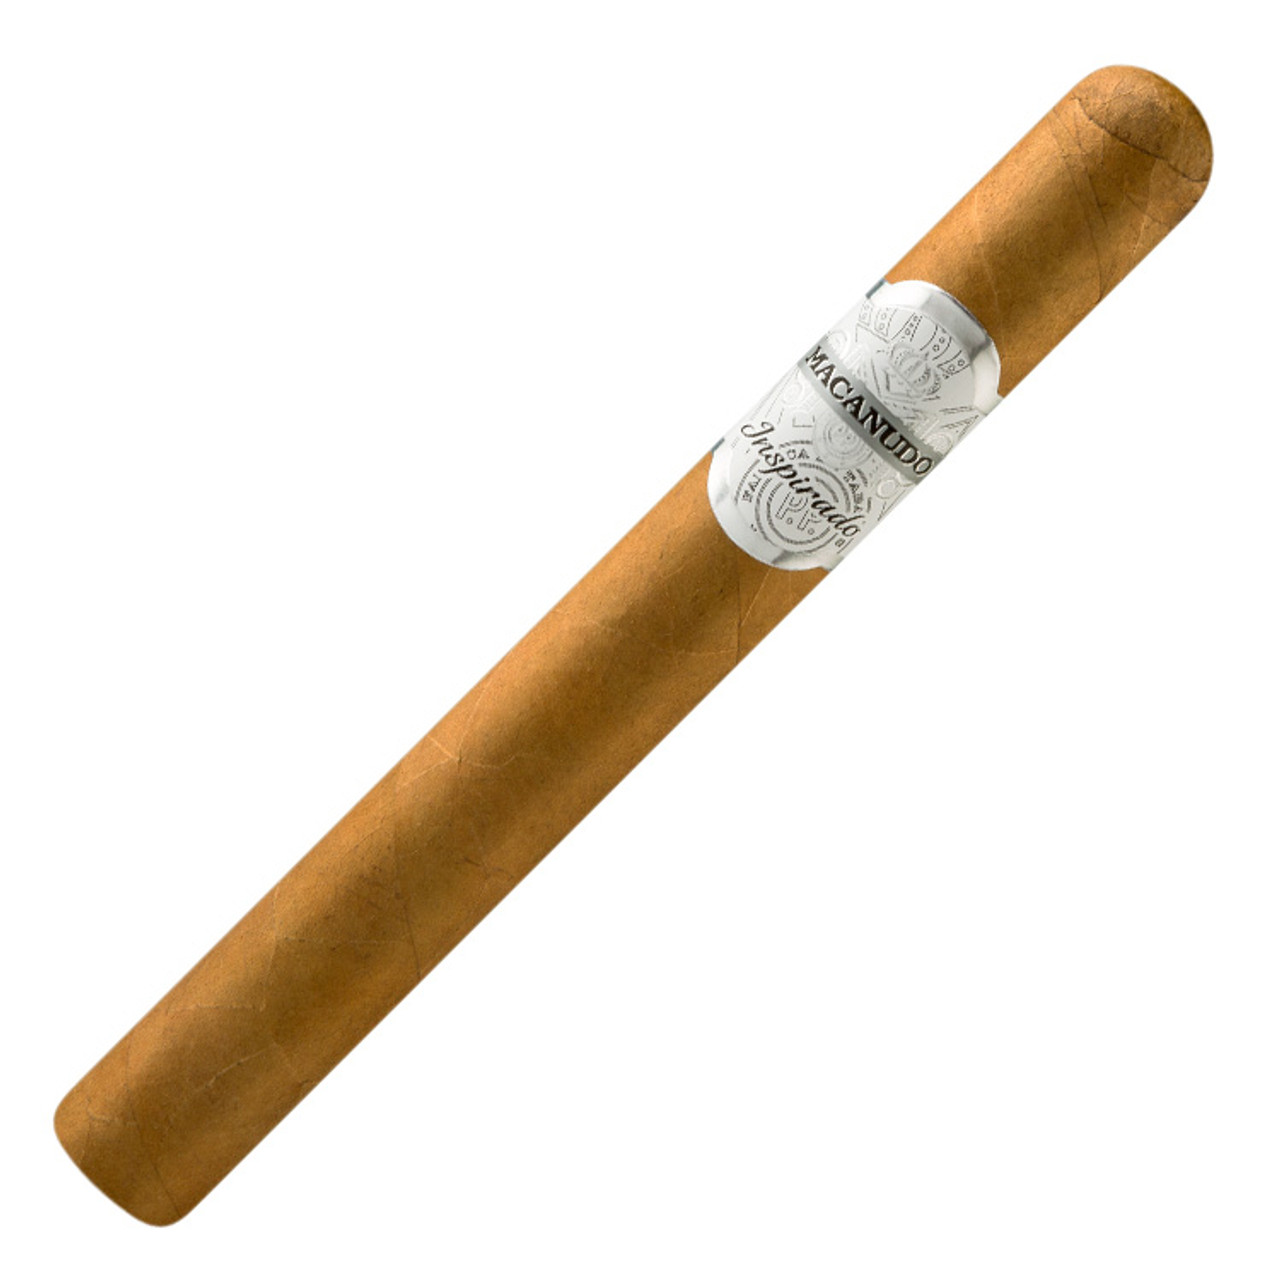 Macanudo Inspirado White Churchill Cigars - 7 x 48 (Box of 20)